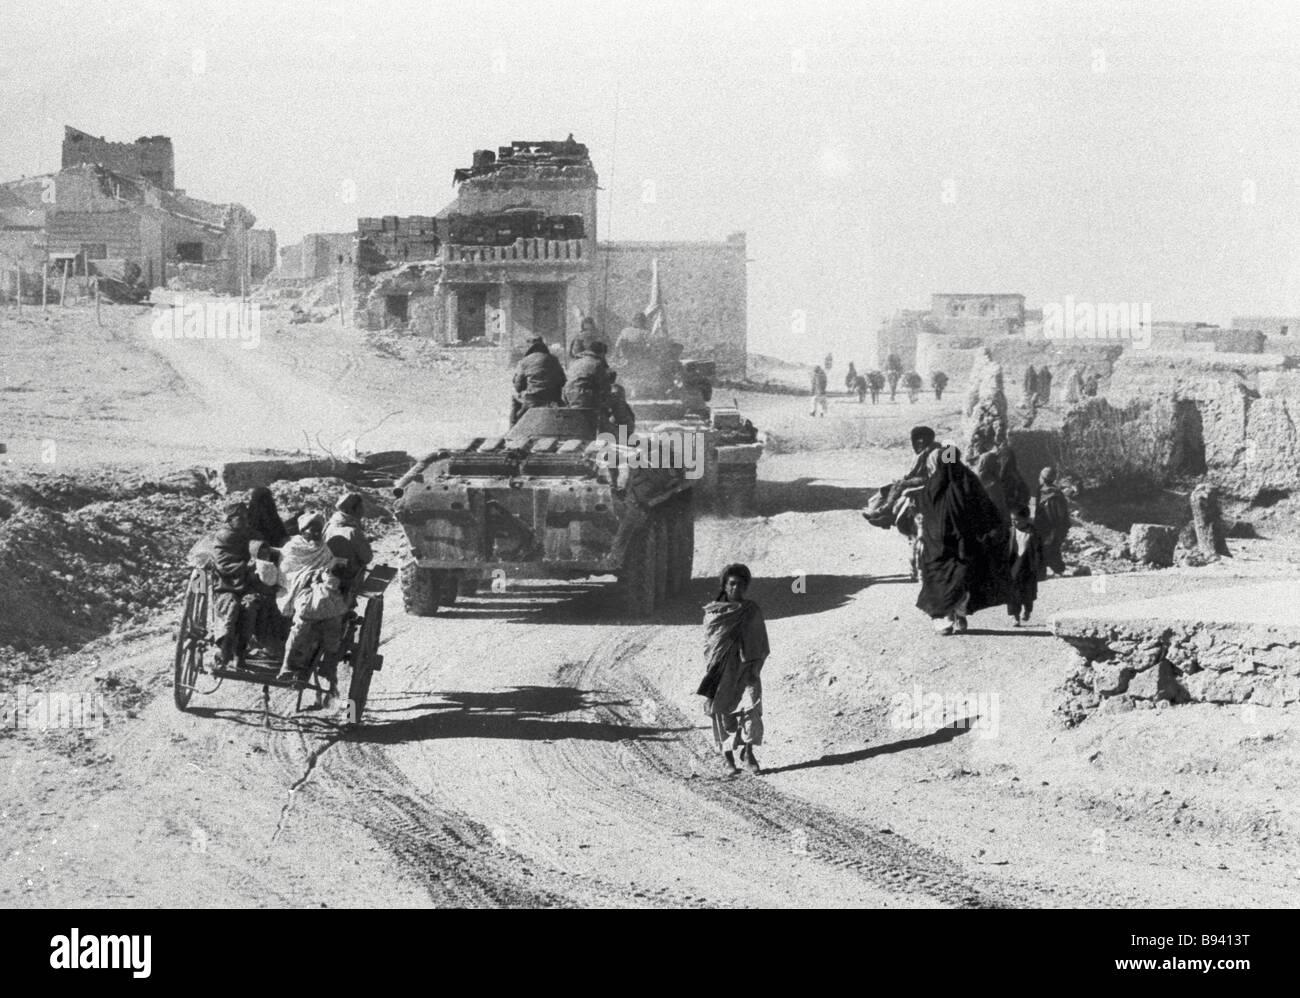 Soviet Afghanistan war - Page 6 Soviet-military-hardware-moves-along-a-kishlak-street-afghanistan-B9413T